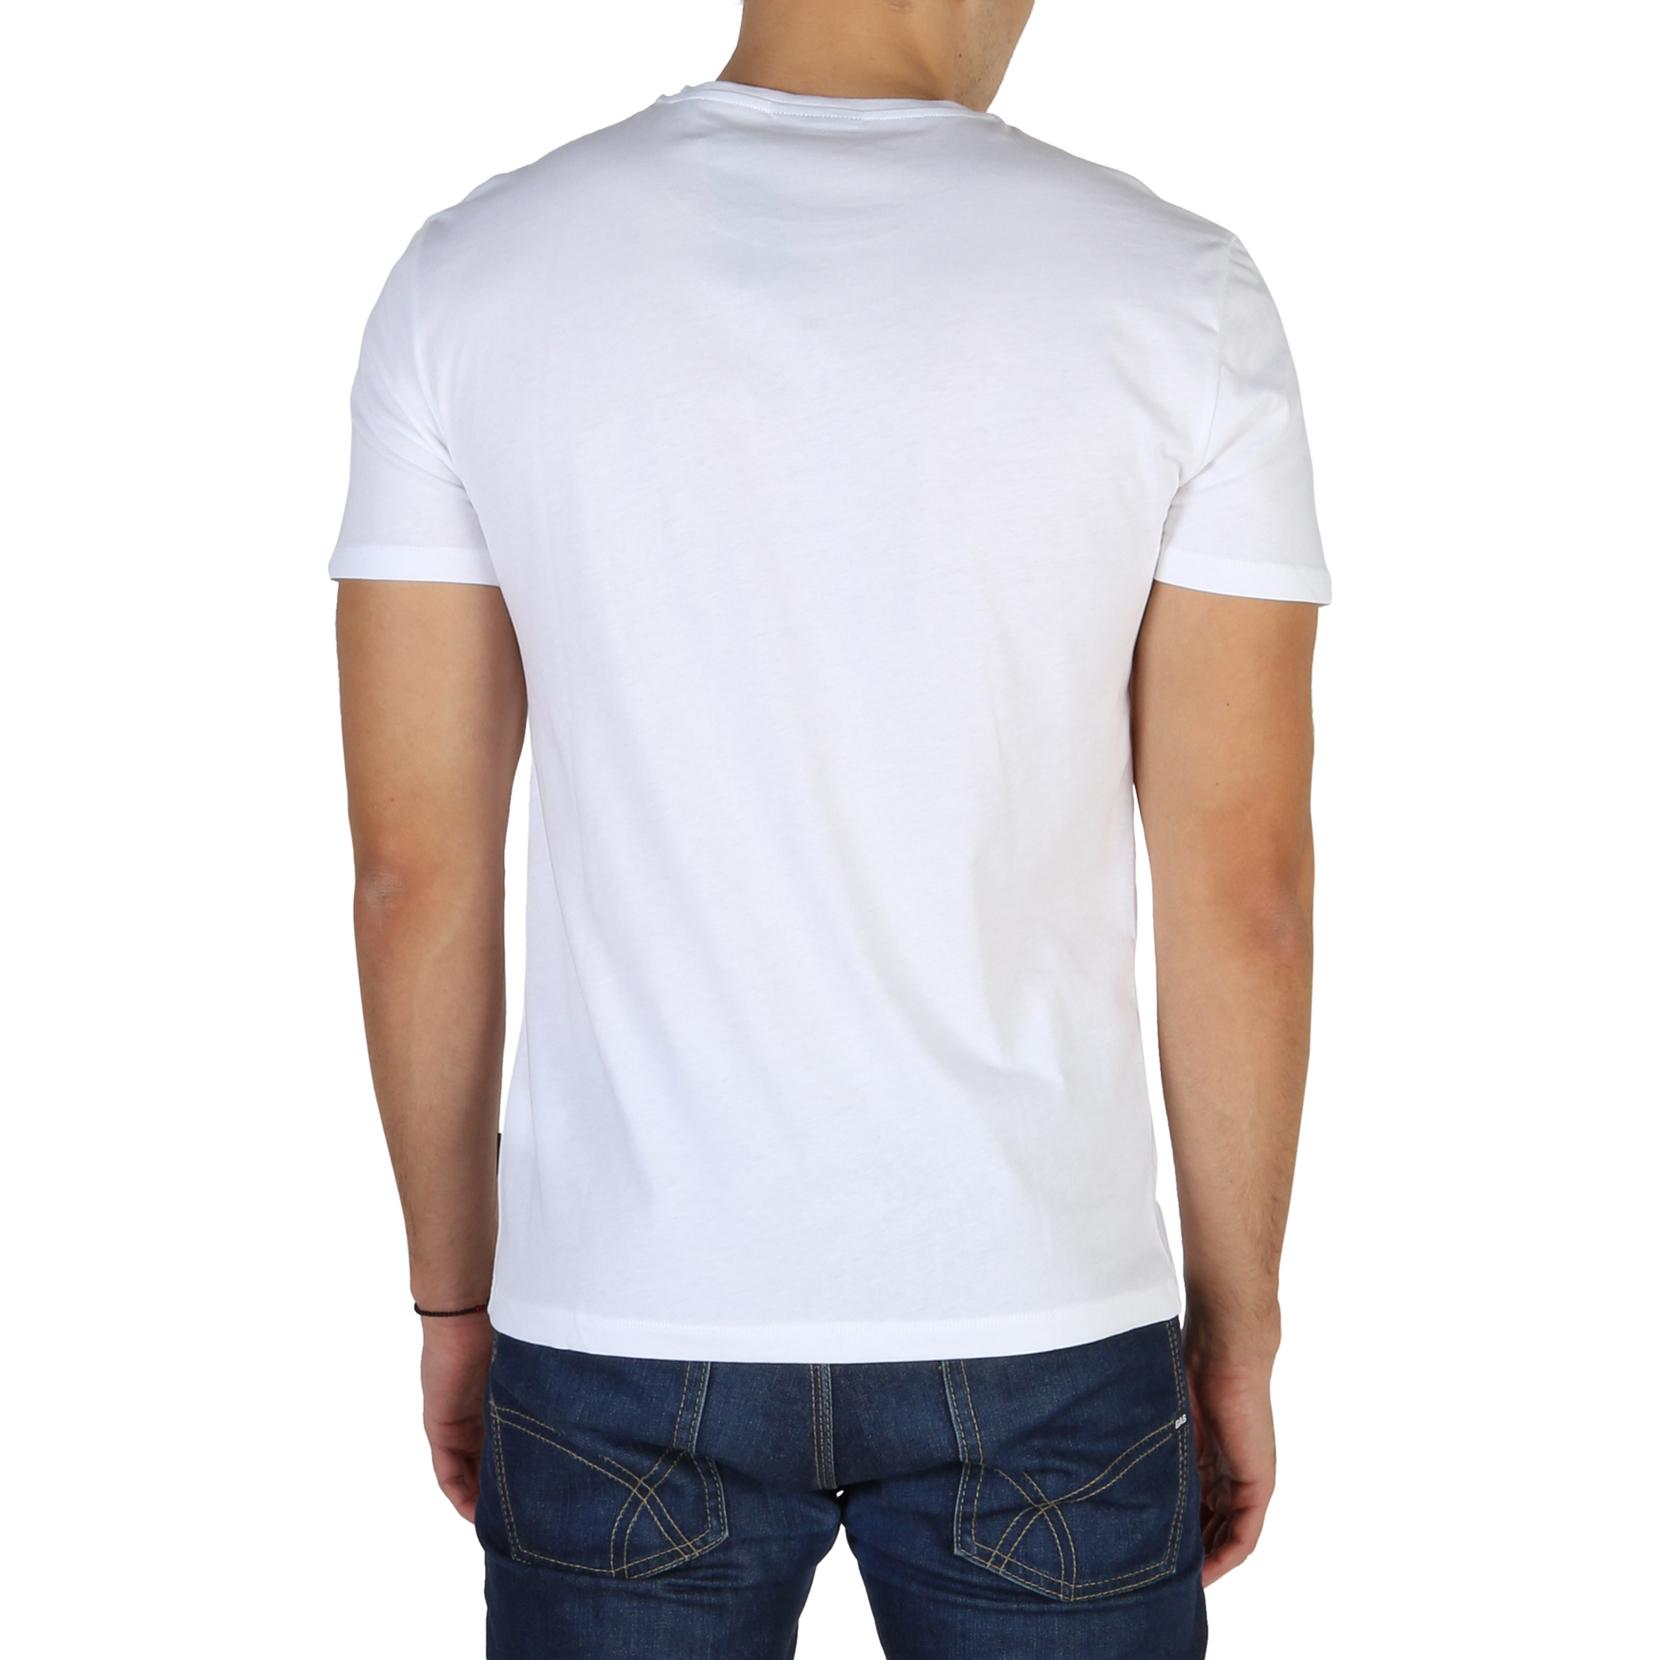 554438-Calvin-Klein-K10K100410-Uomo-Bianco-104182104182 miniatura 2